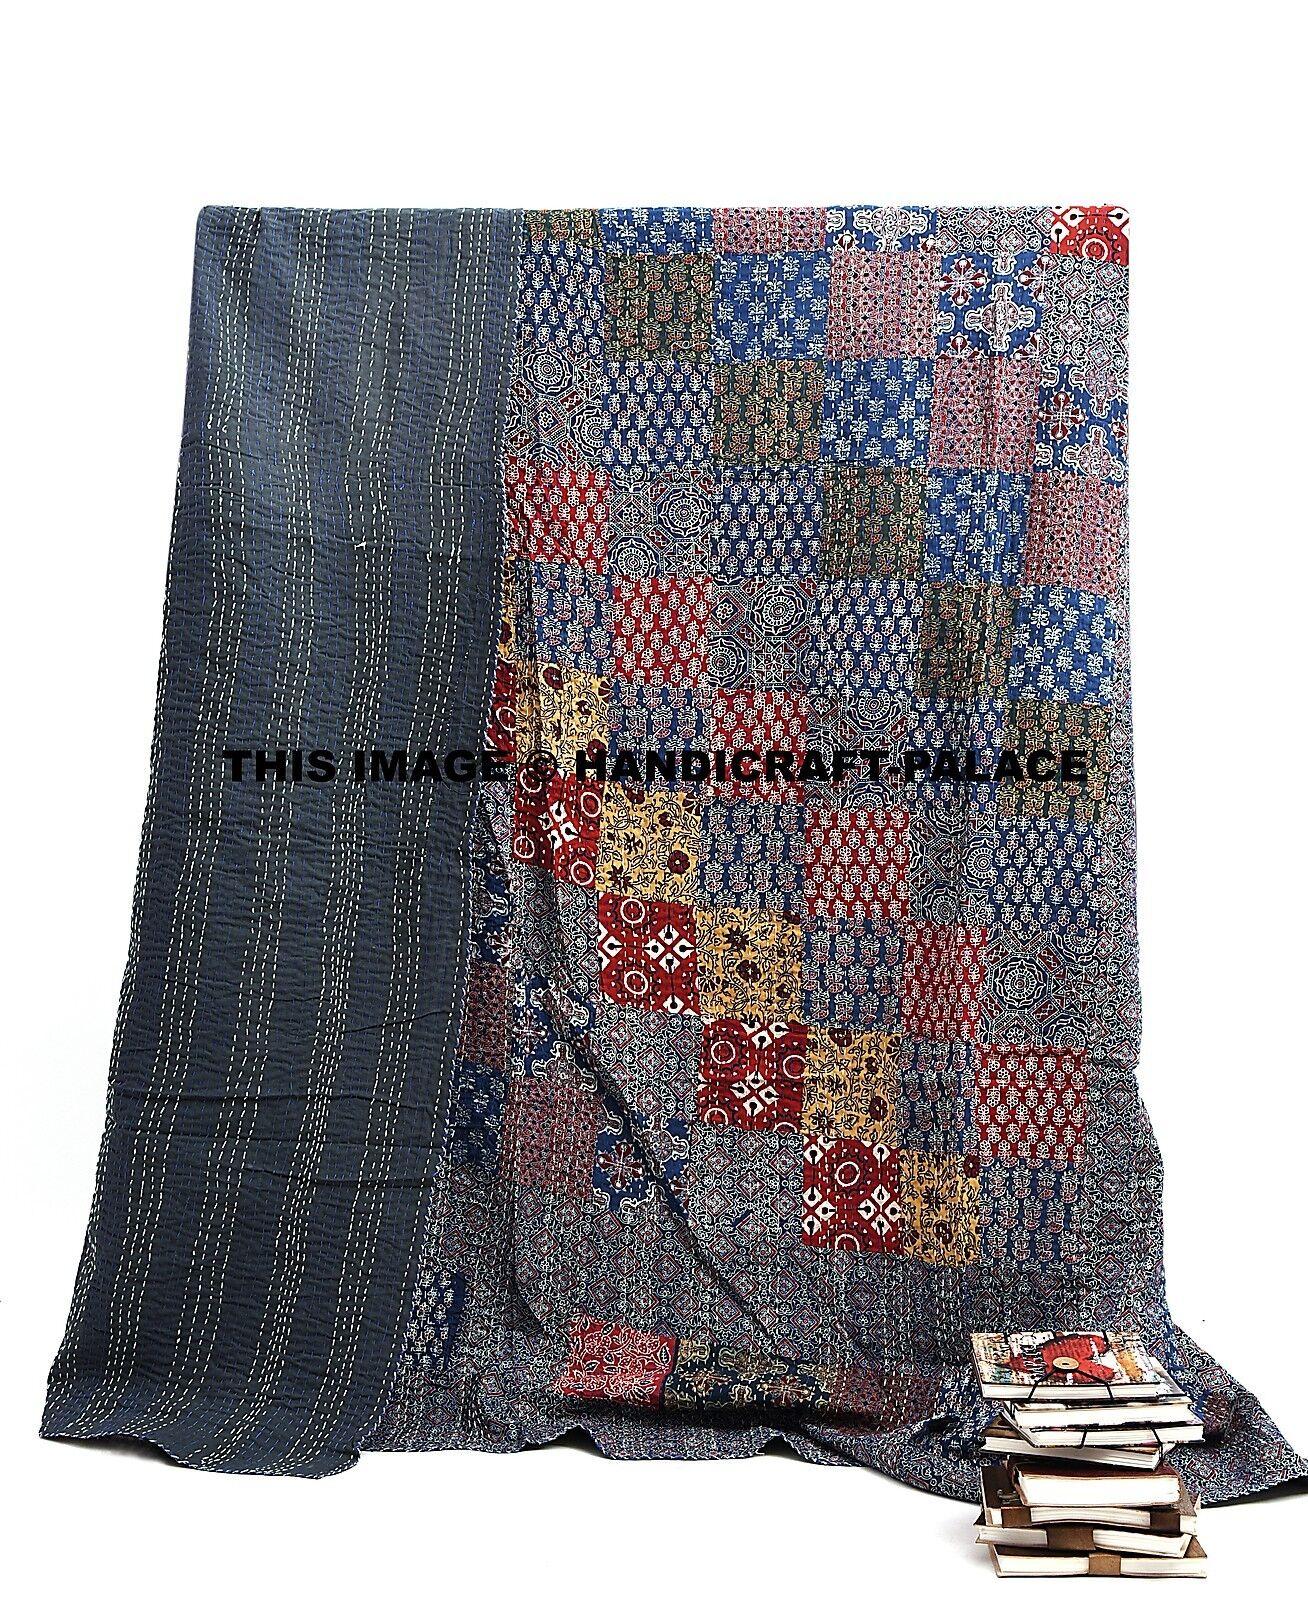 Indian Patchwork King Kantha Quilt Vintage Ajrakh Bedspread Throw Cotton Gudri